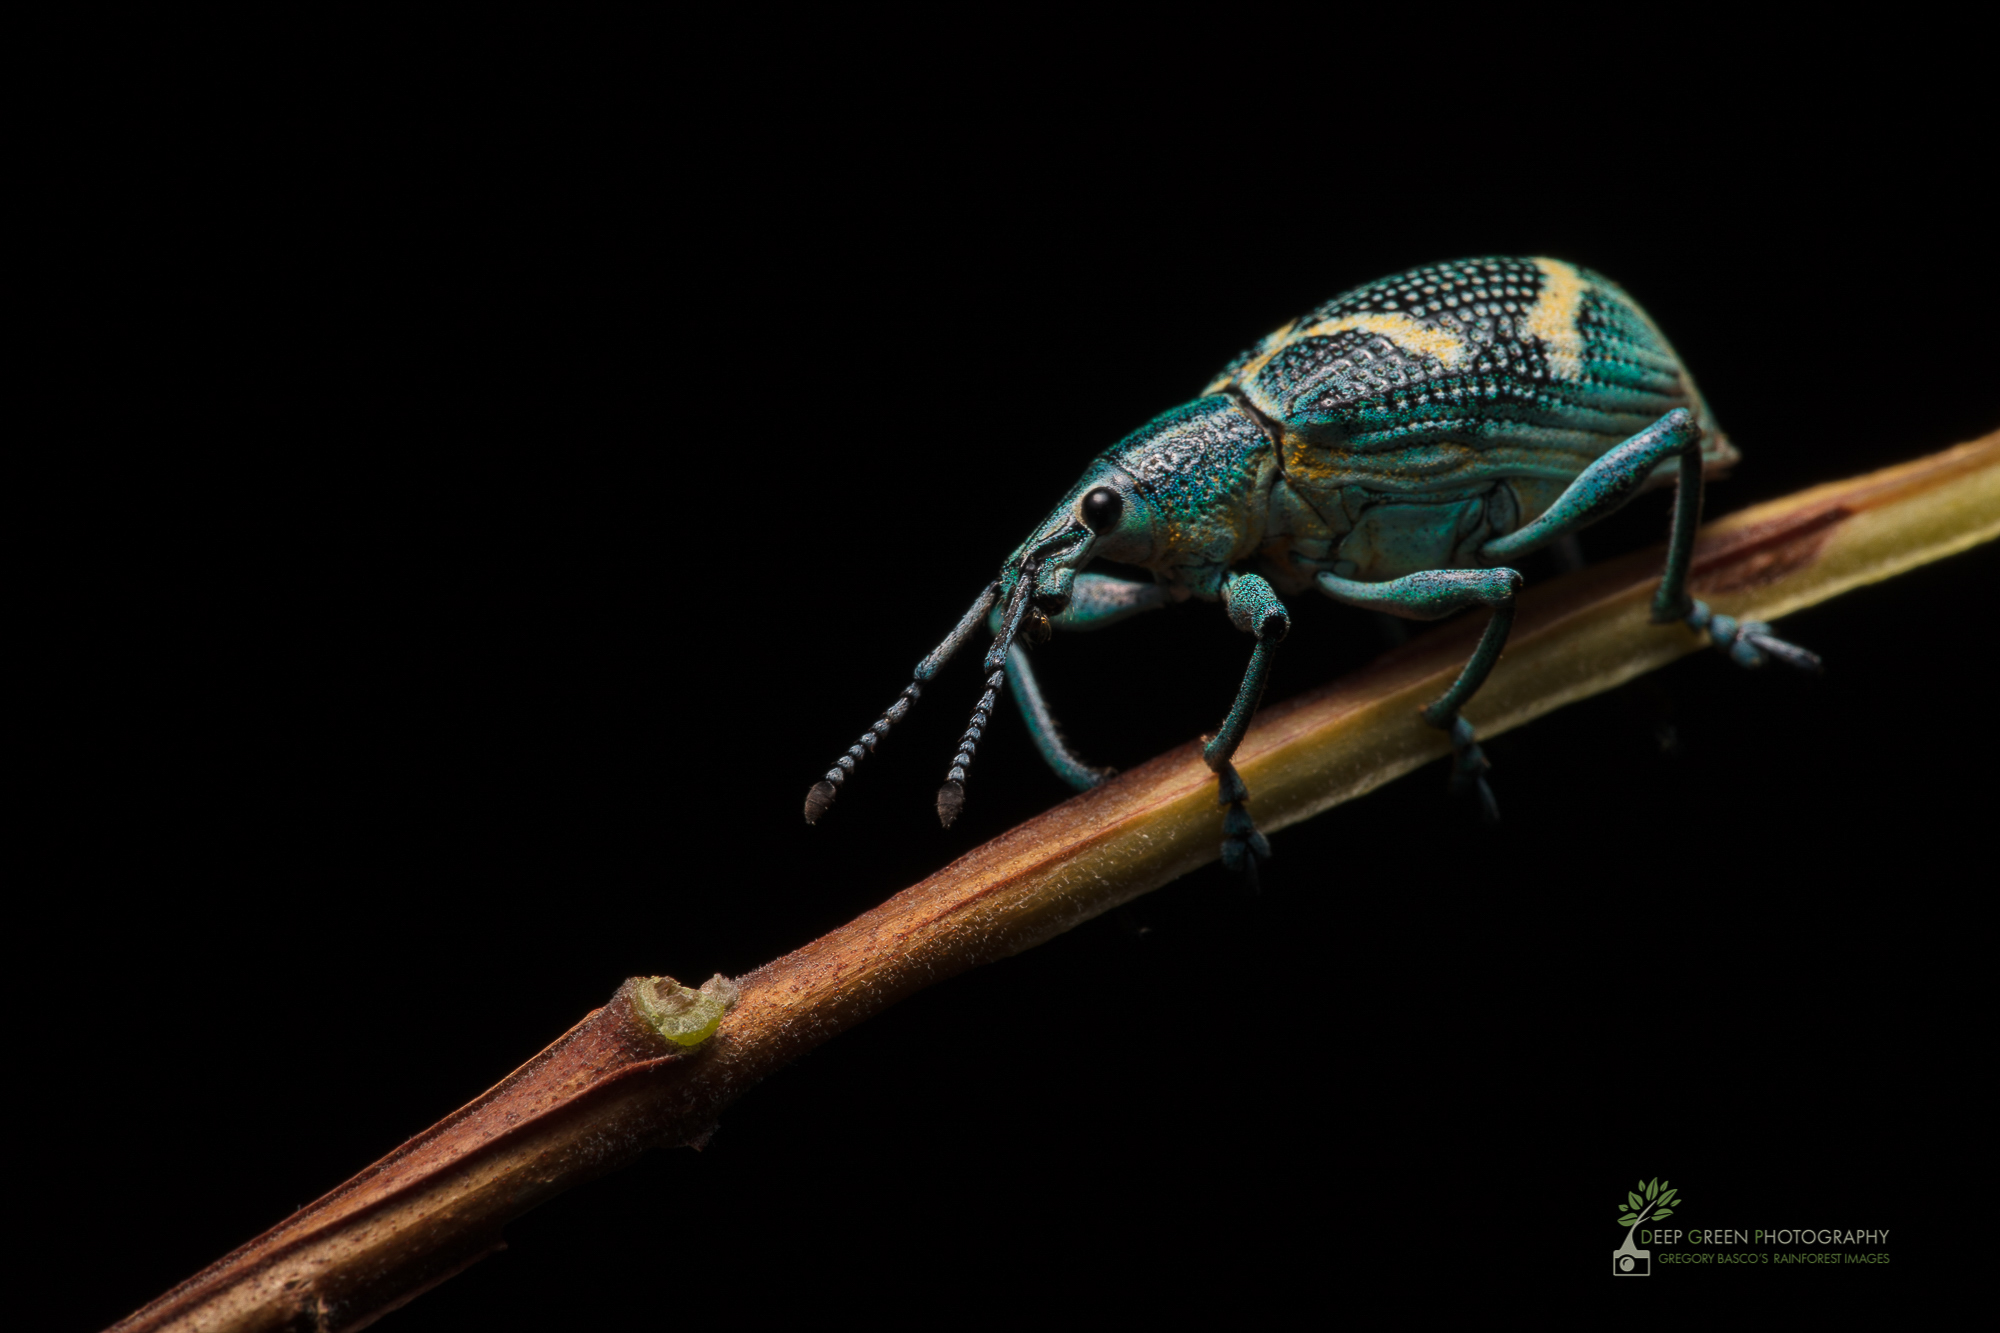 DGP-stock-invertebrates-75.jpg